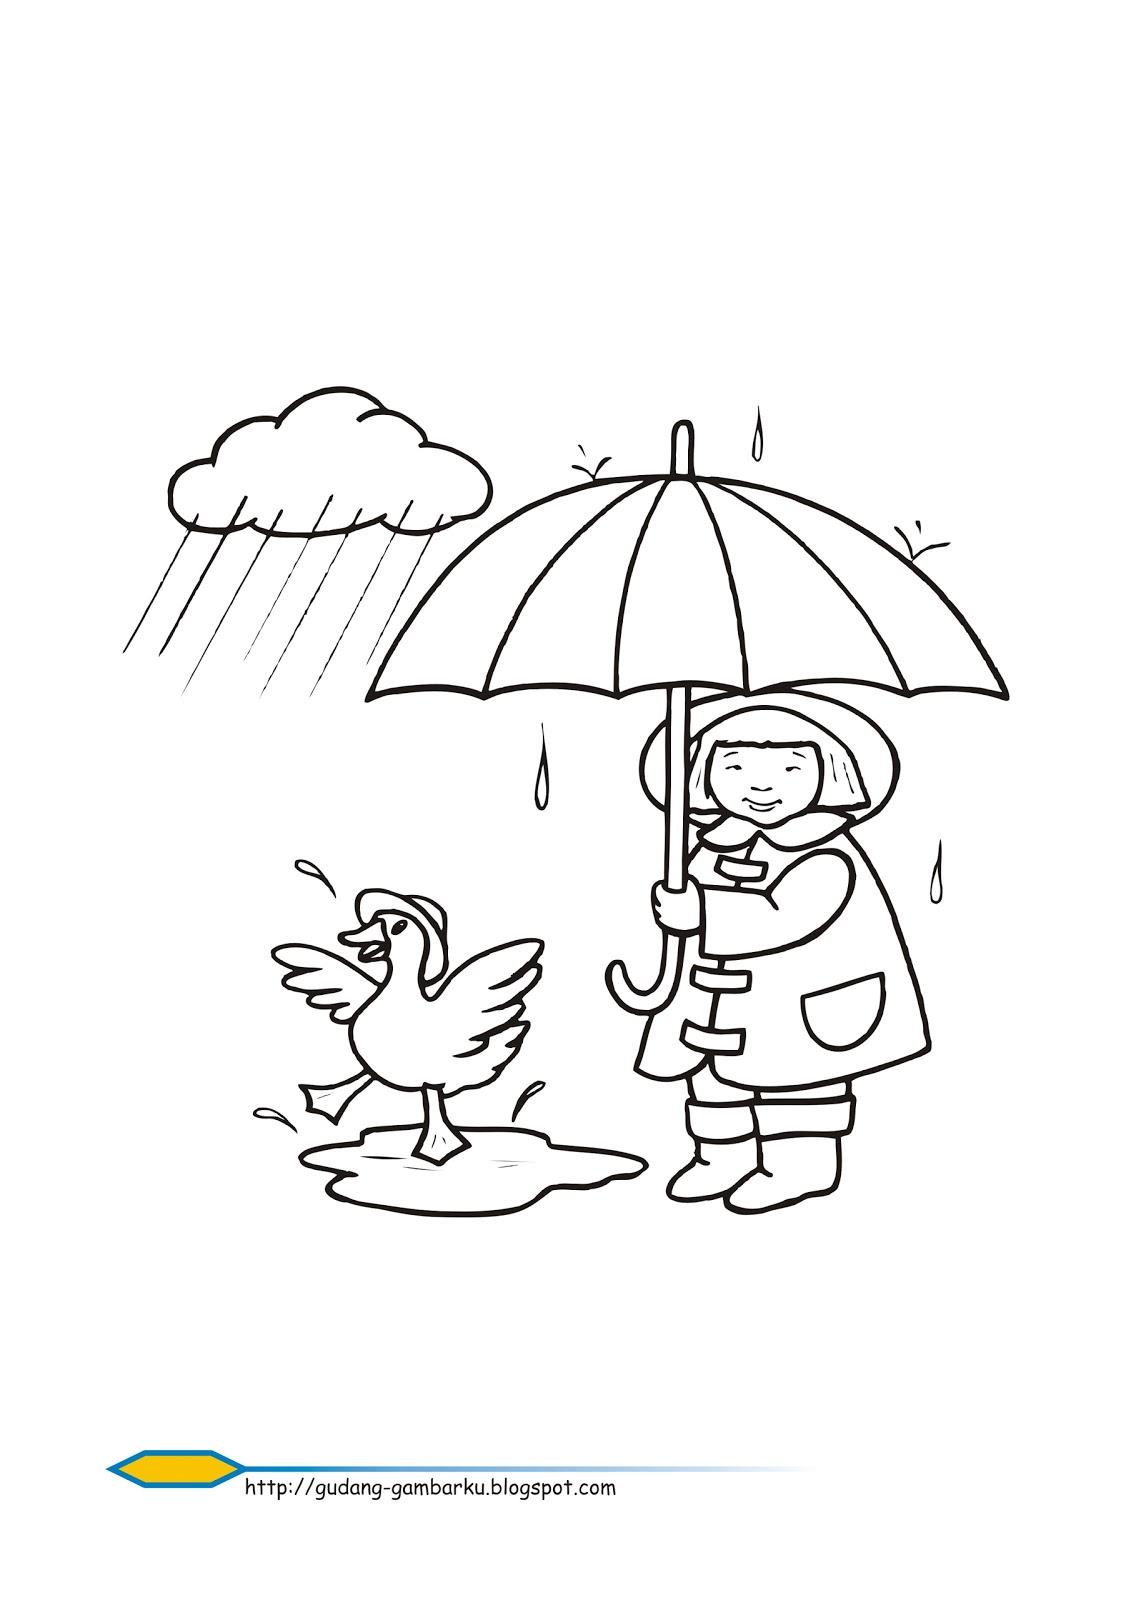 Mewarnai Gambar Hujan : mewarnai, gambar, hujan, Mewarnai, Pemandangan, Hujan